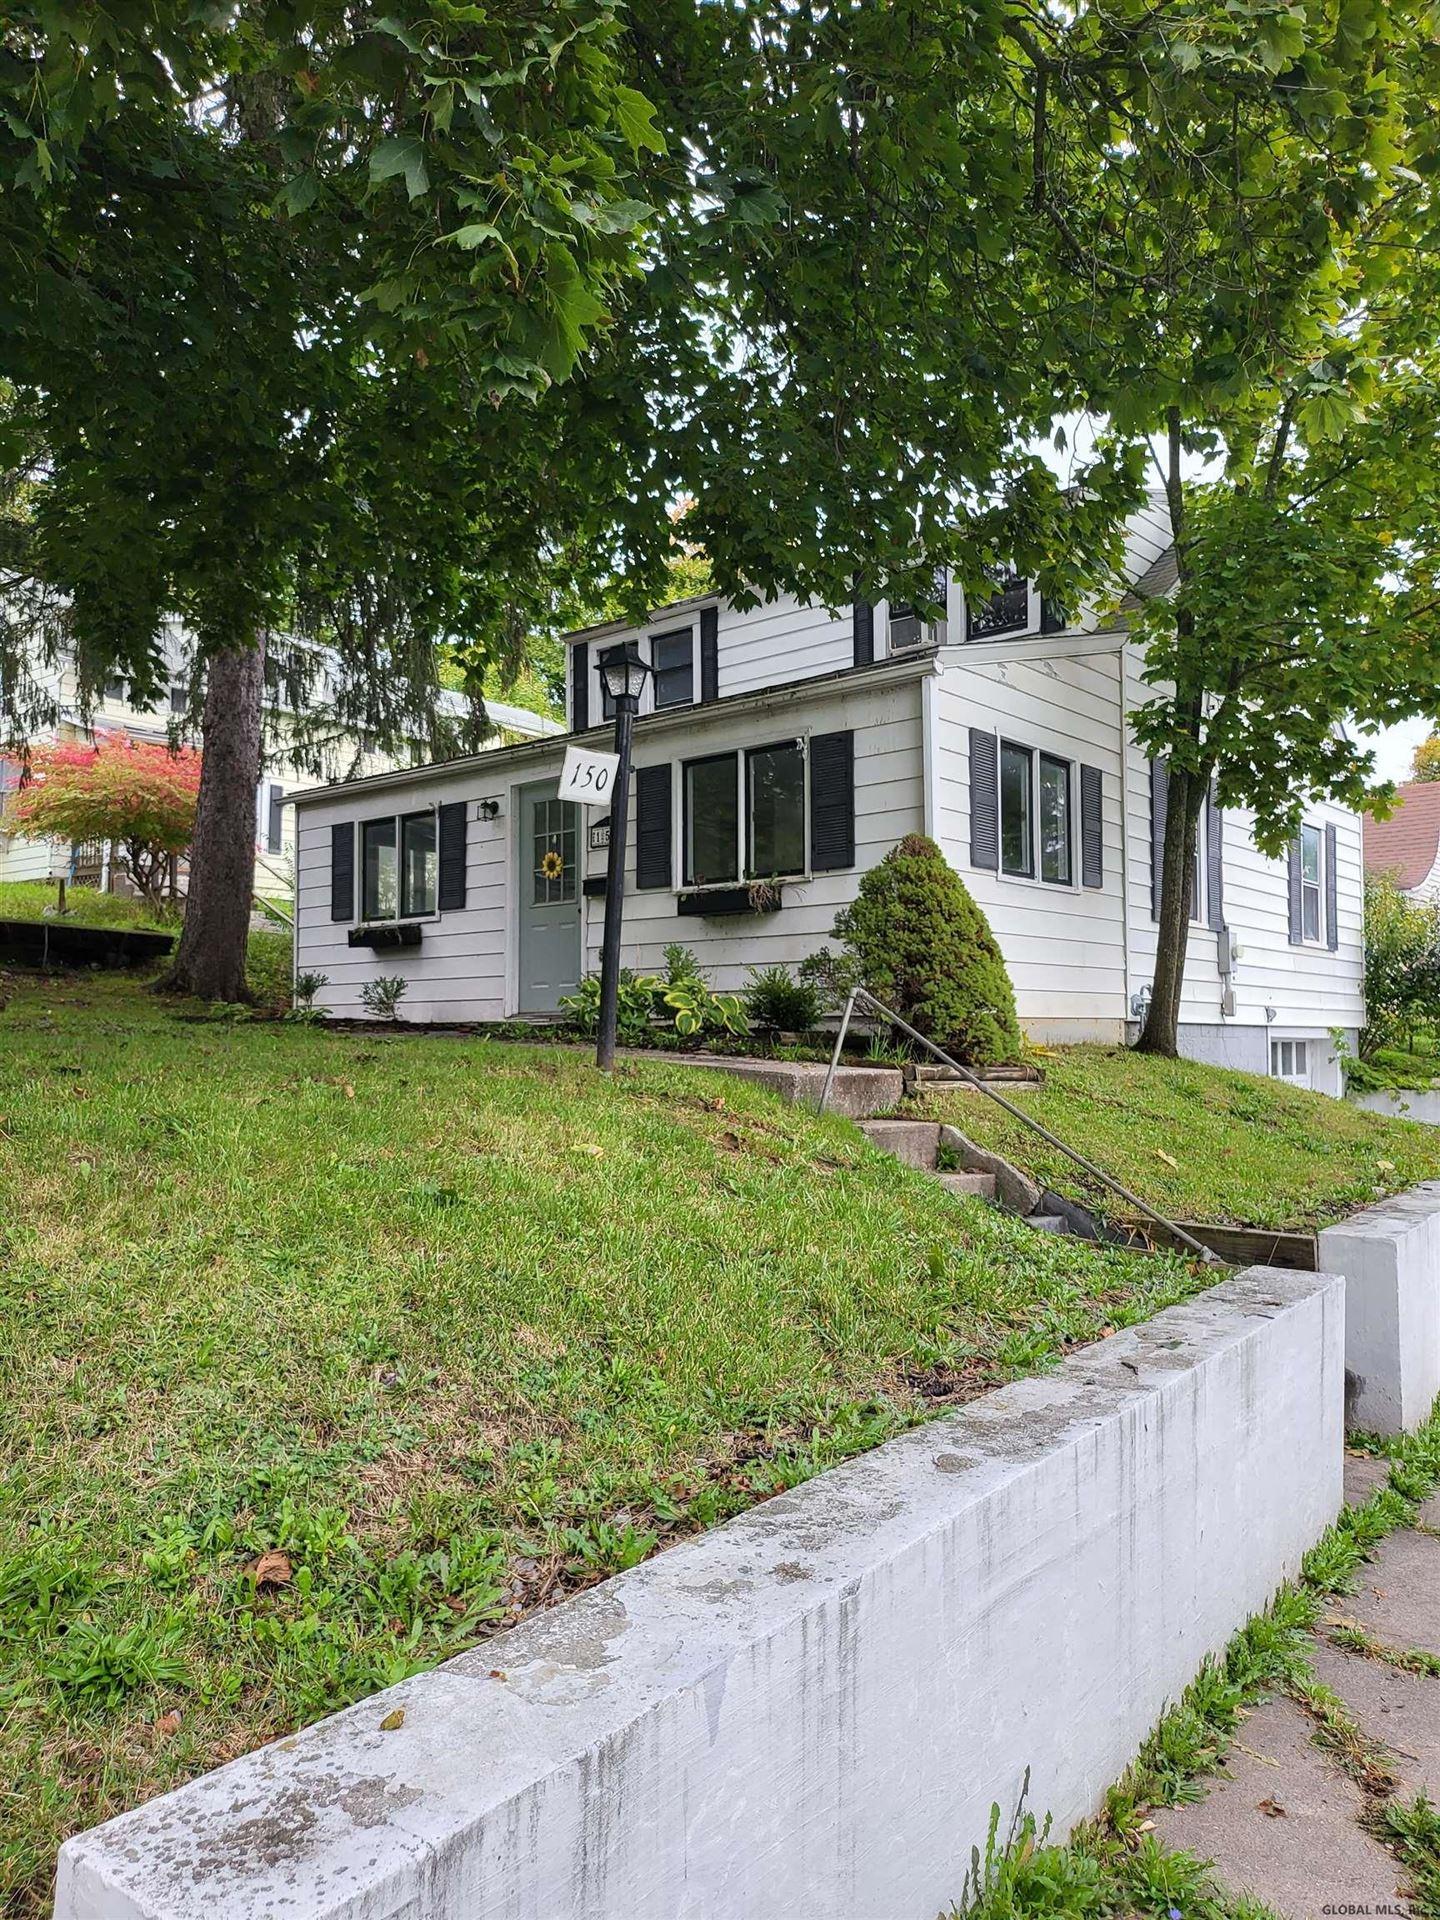 150 WASHINGTON AV, Cobleskill, NY 12043 - MLS#: 202129961